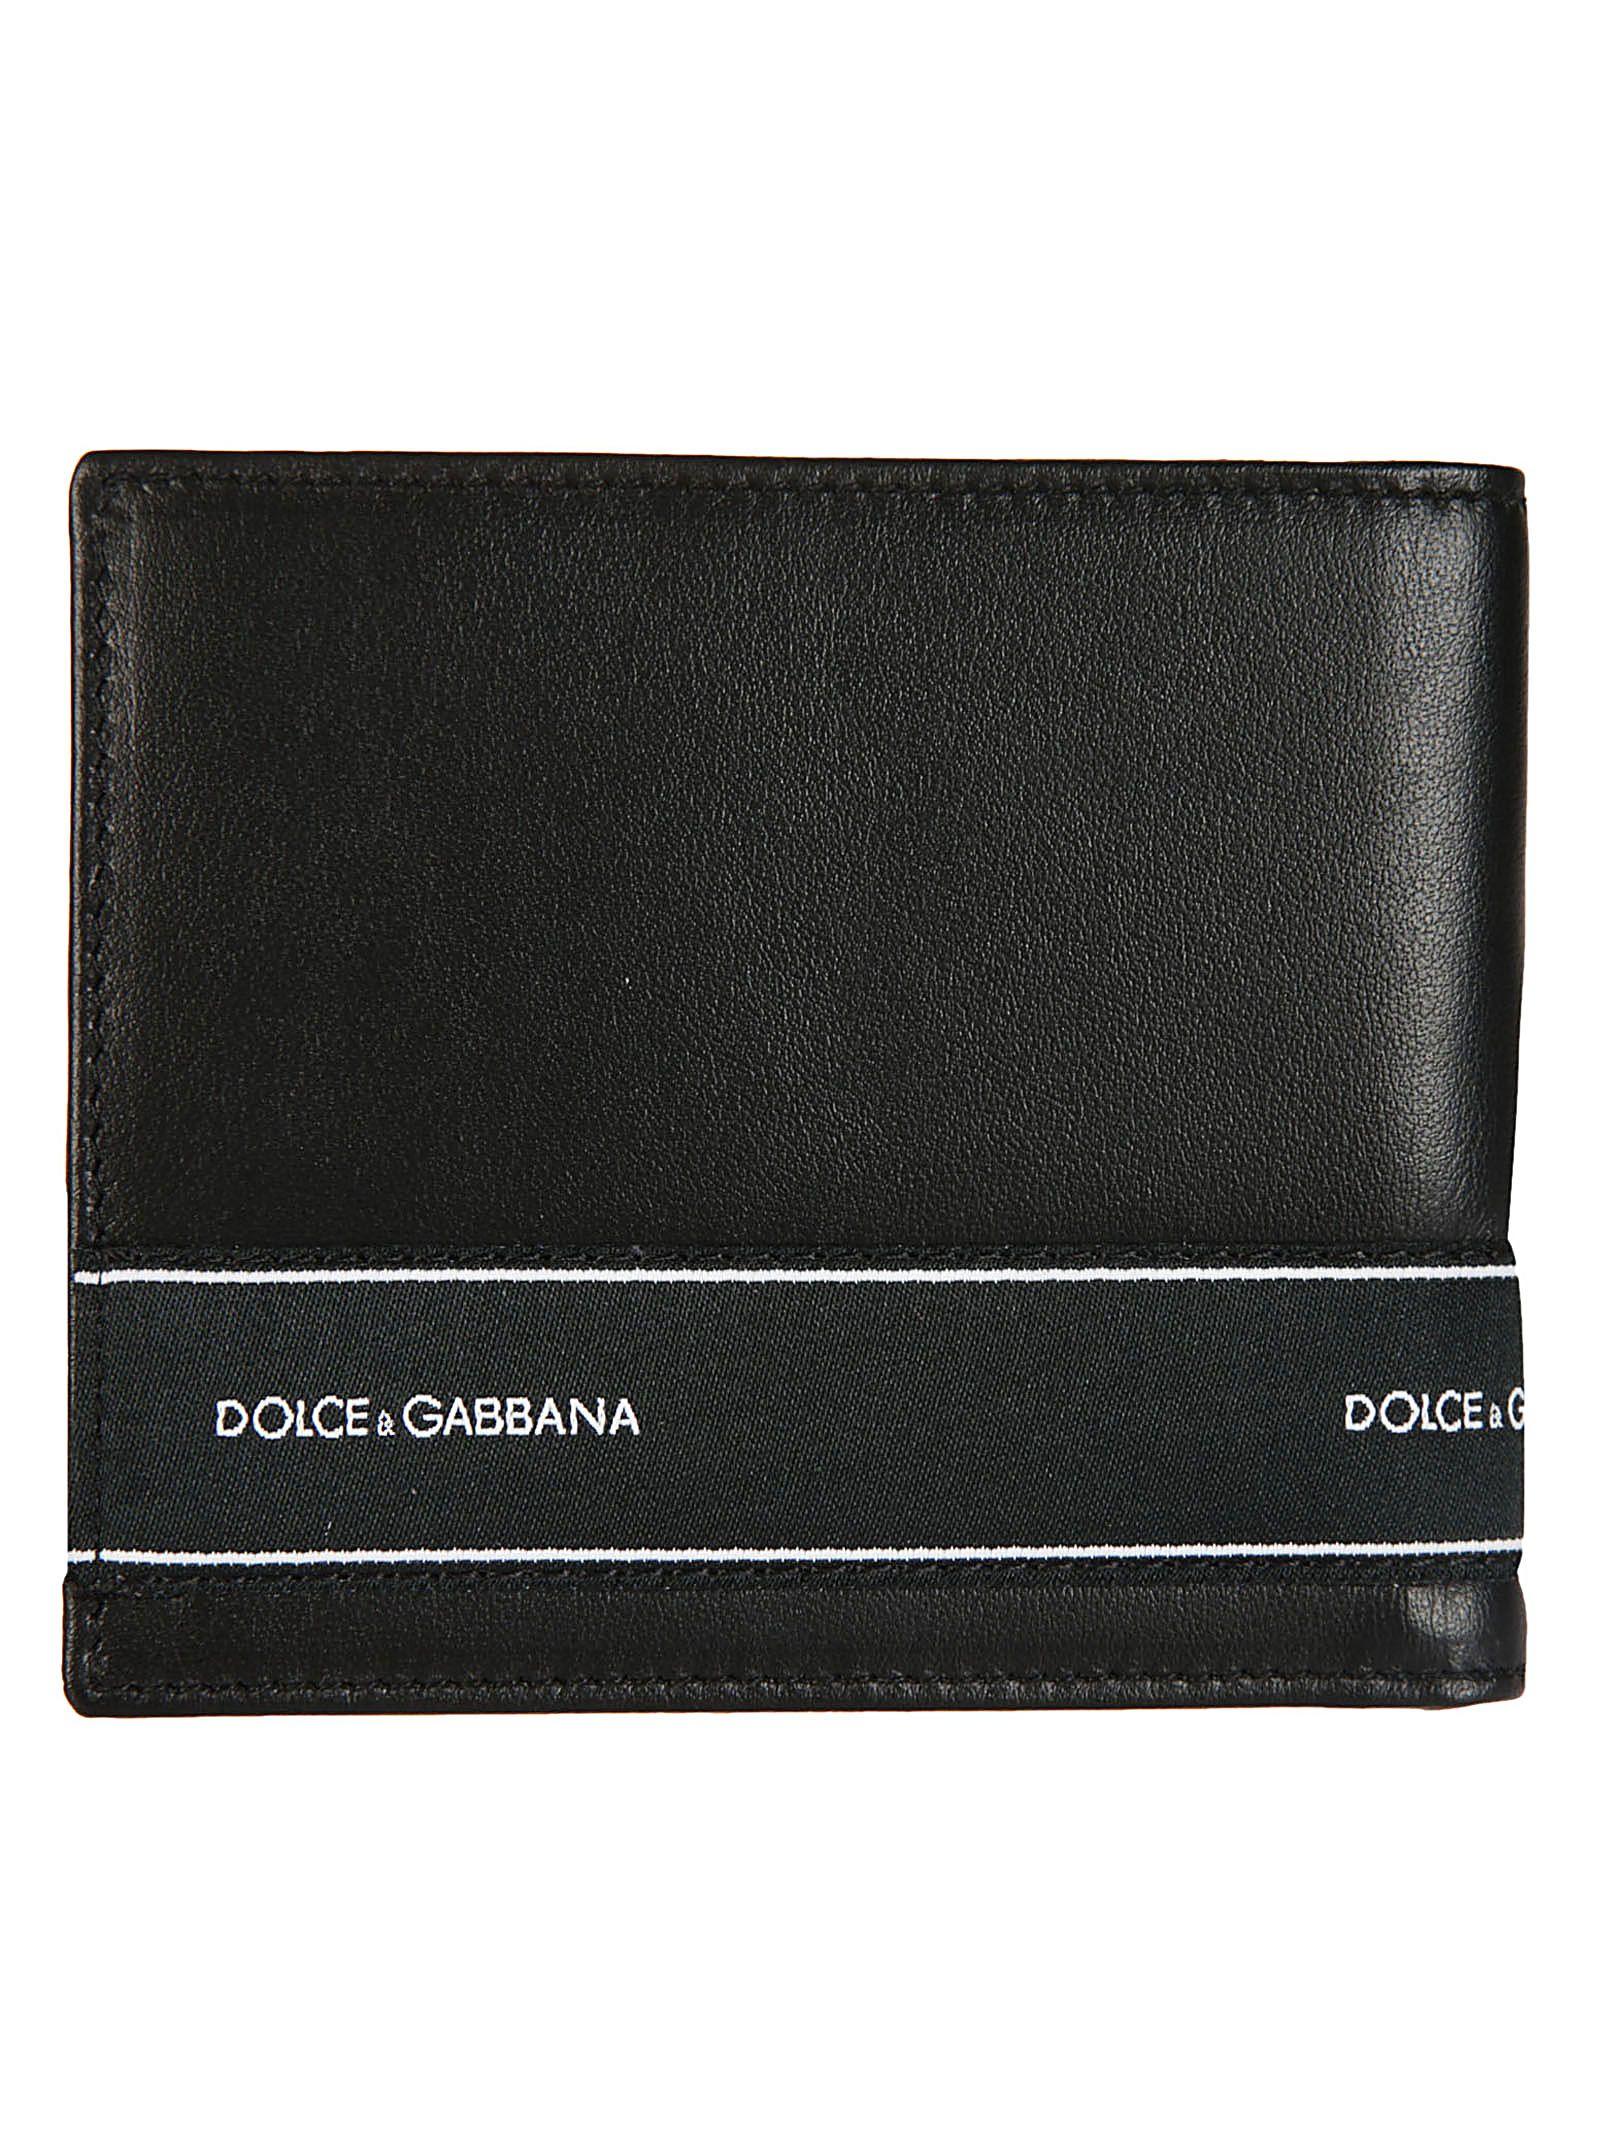 fold out purse - Black Dolce & Gabbana 9mbrlg